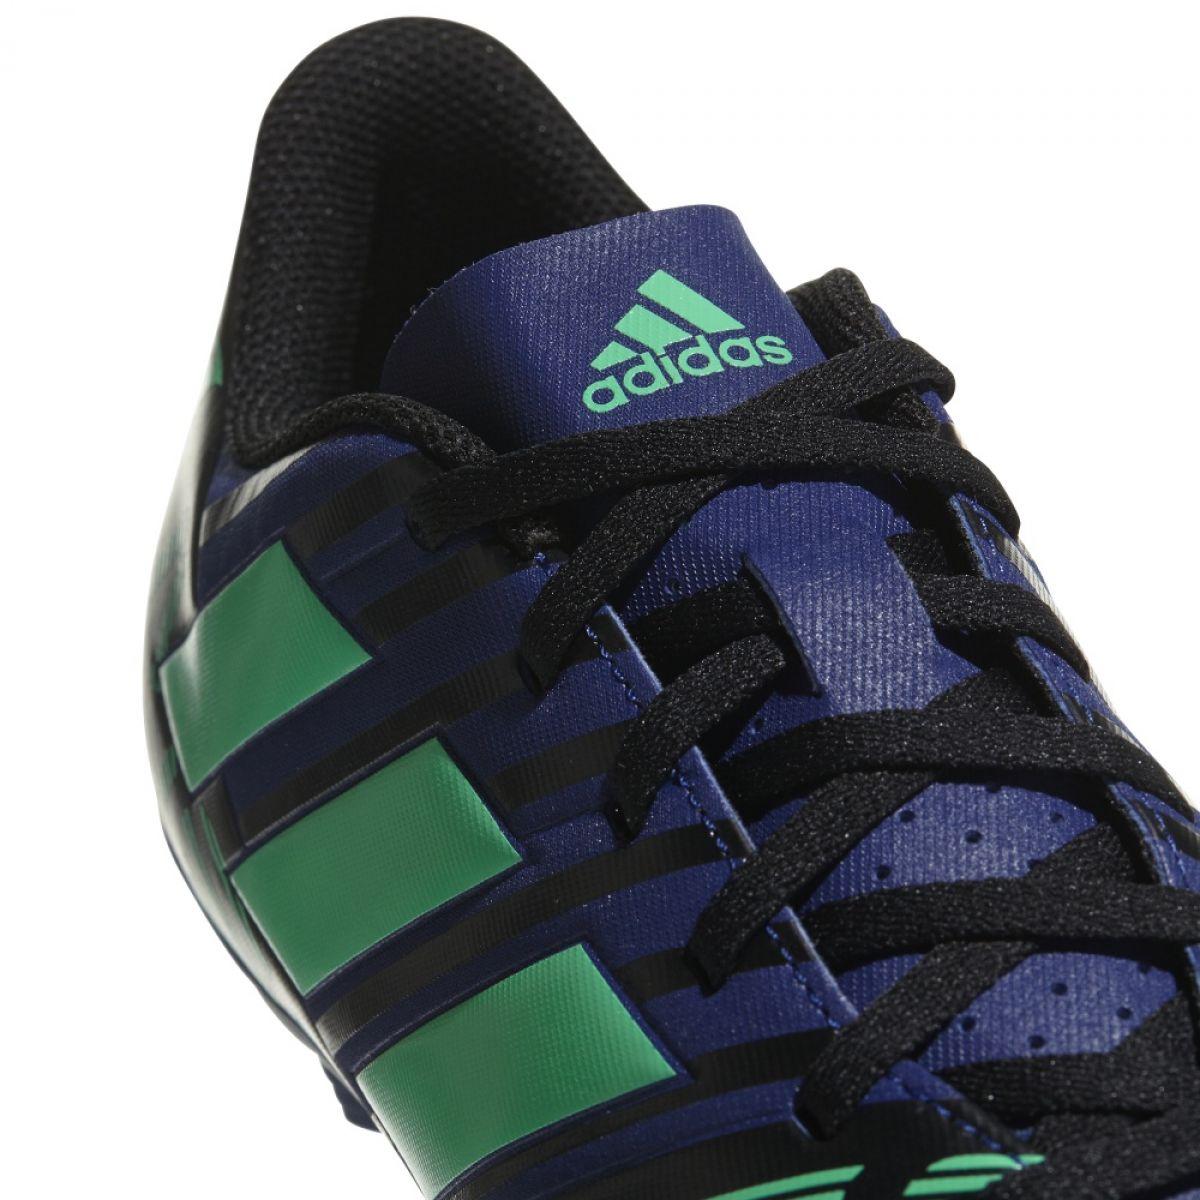 Buty adidas Nemeziz Messi Tango CP9048 43 13 7366778158